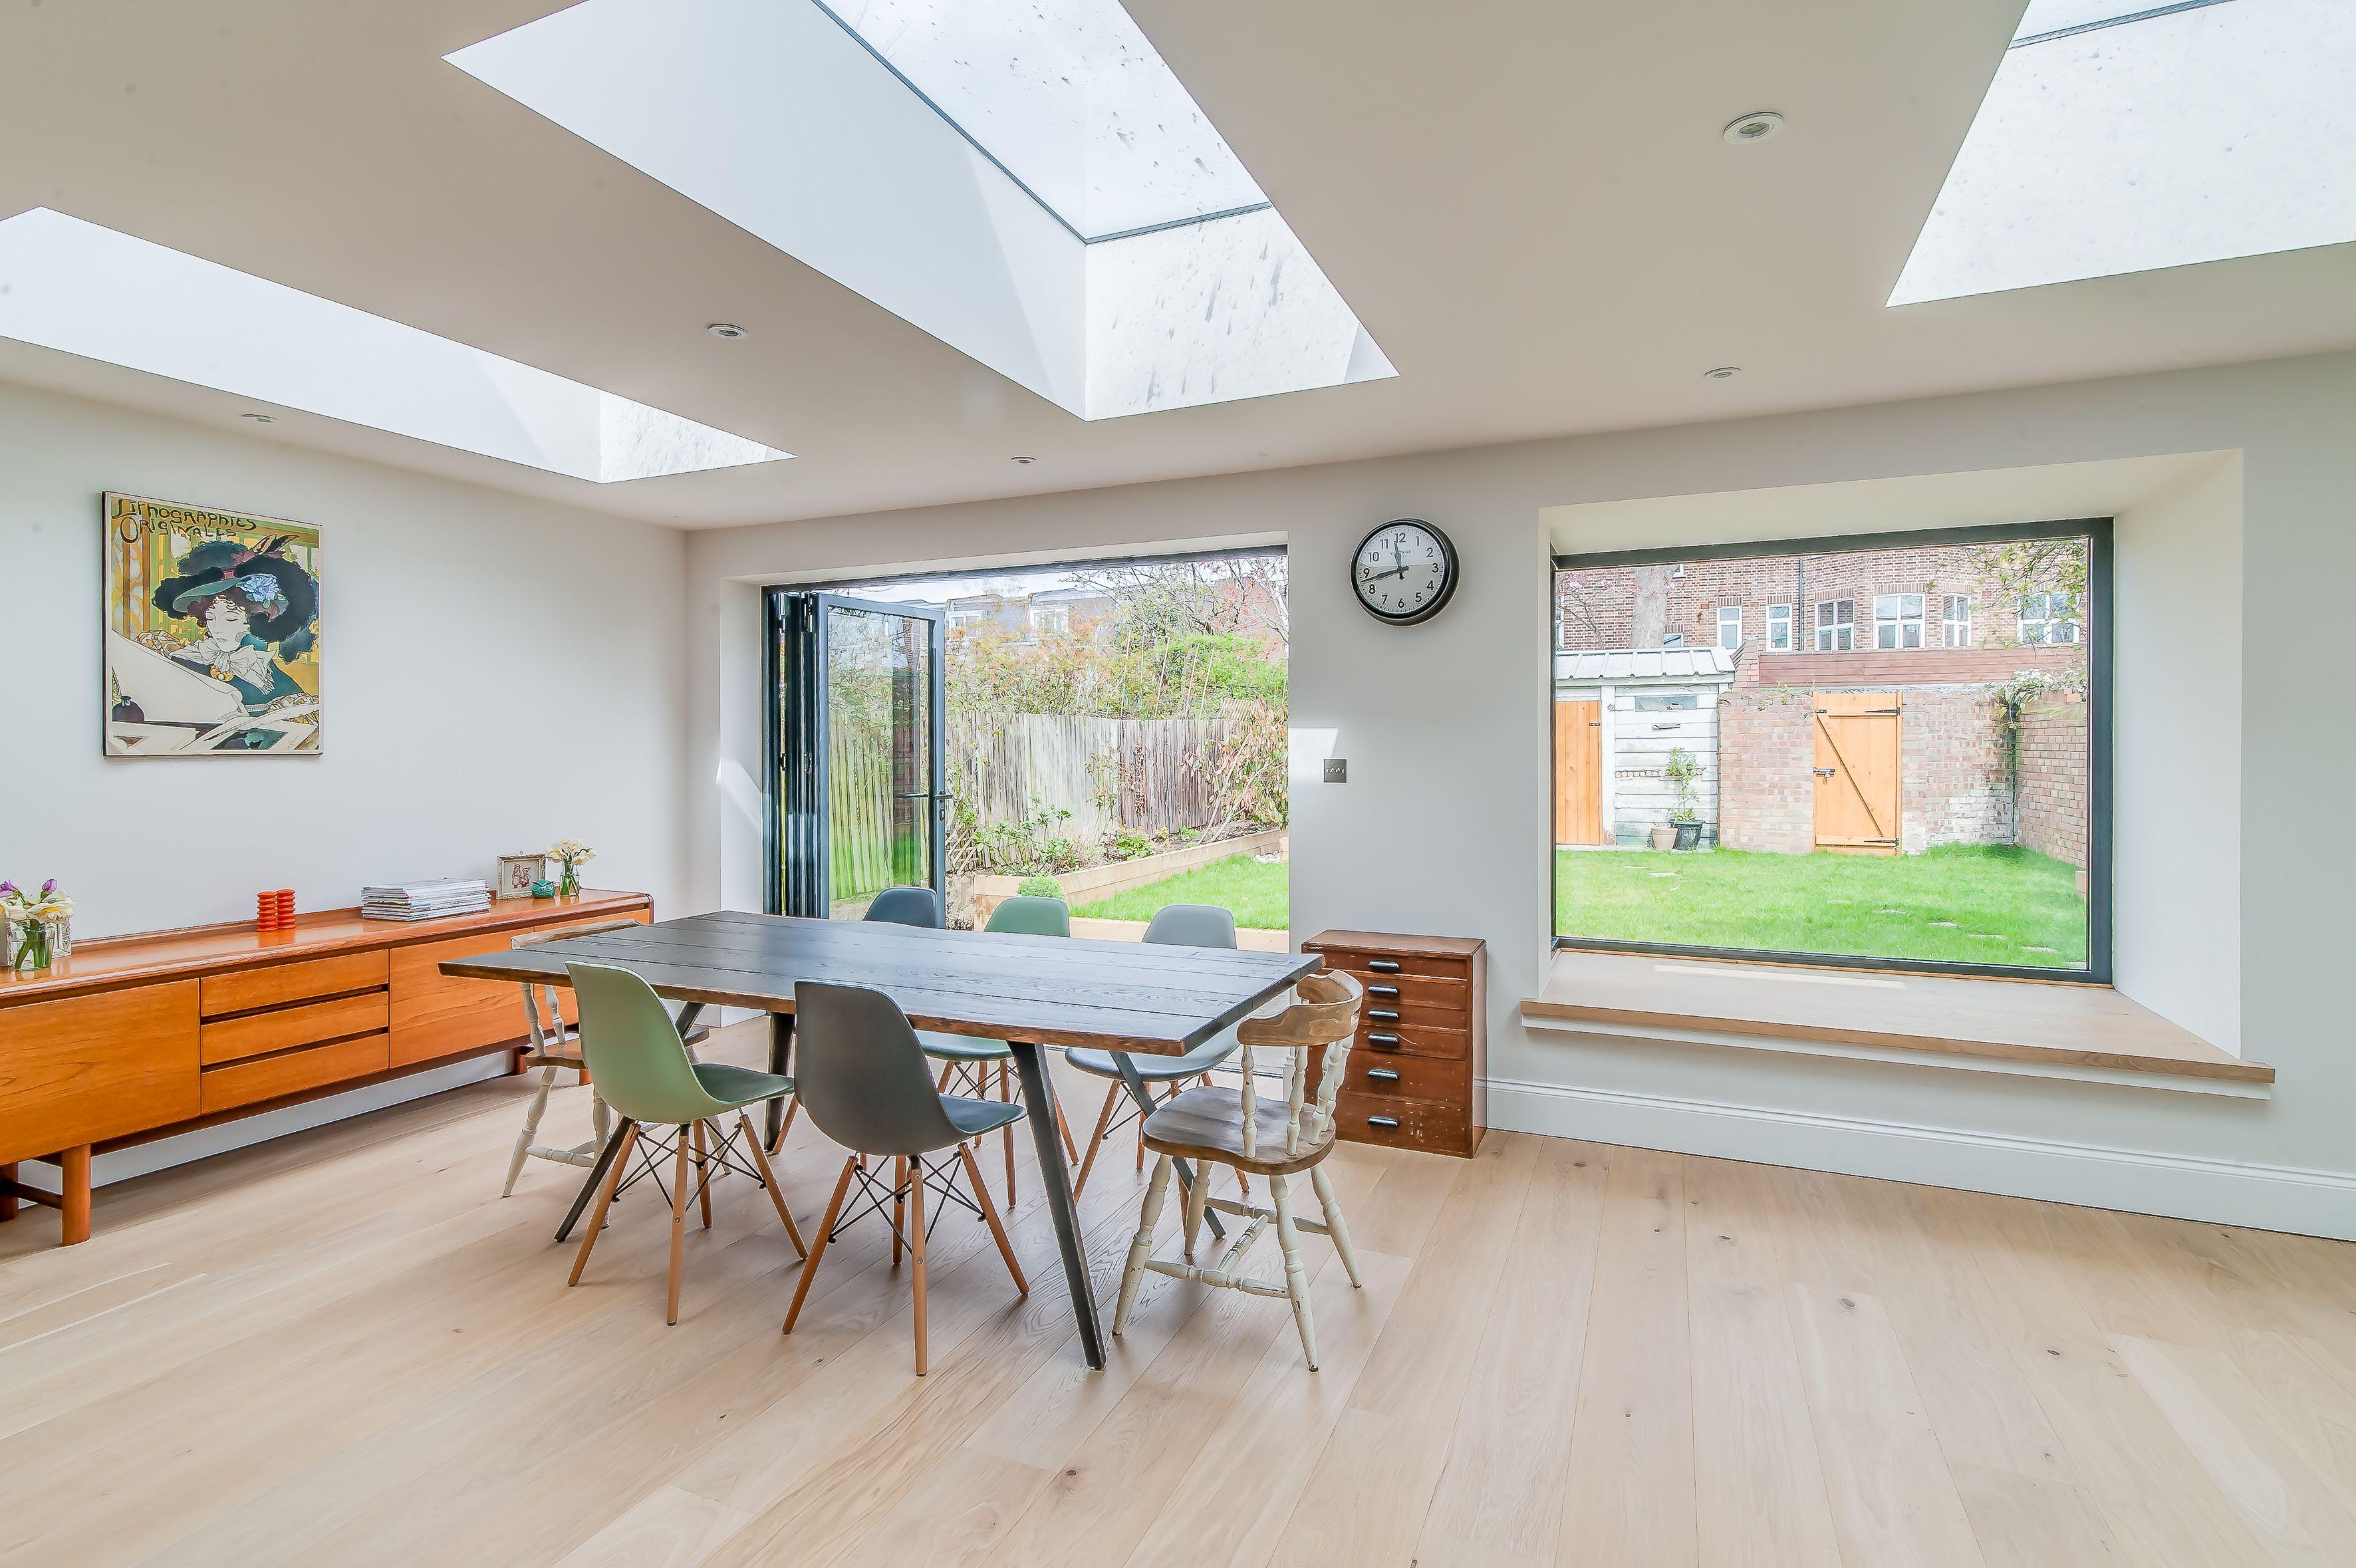 Ground Floor Window : Degrees north architects ground floor rear extension in